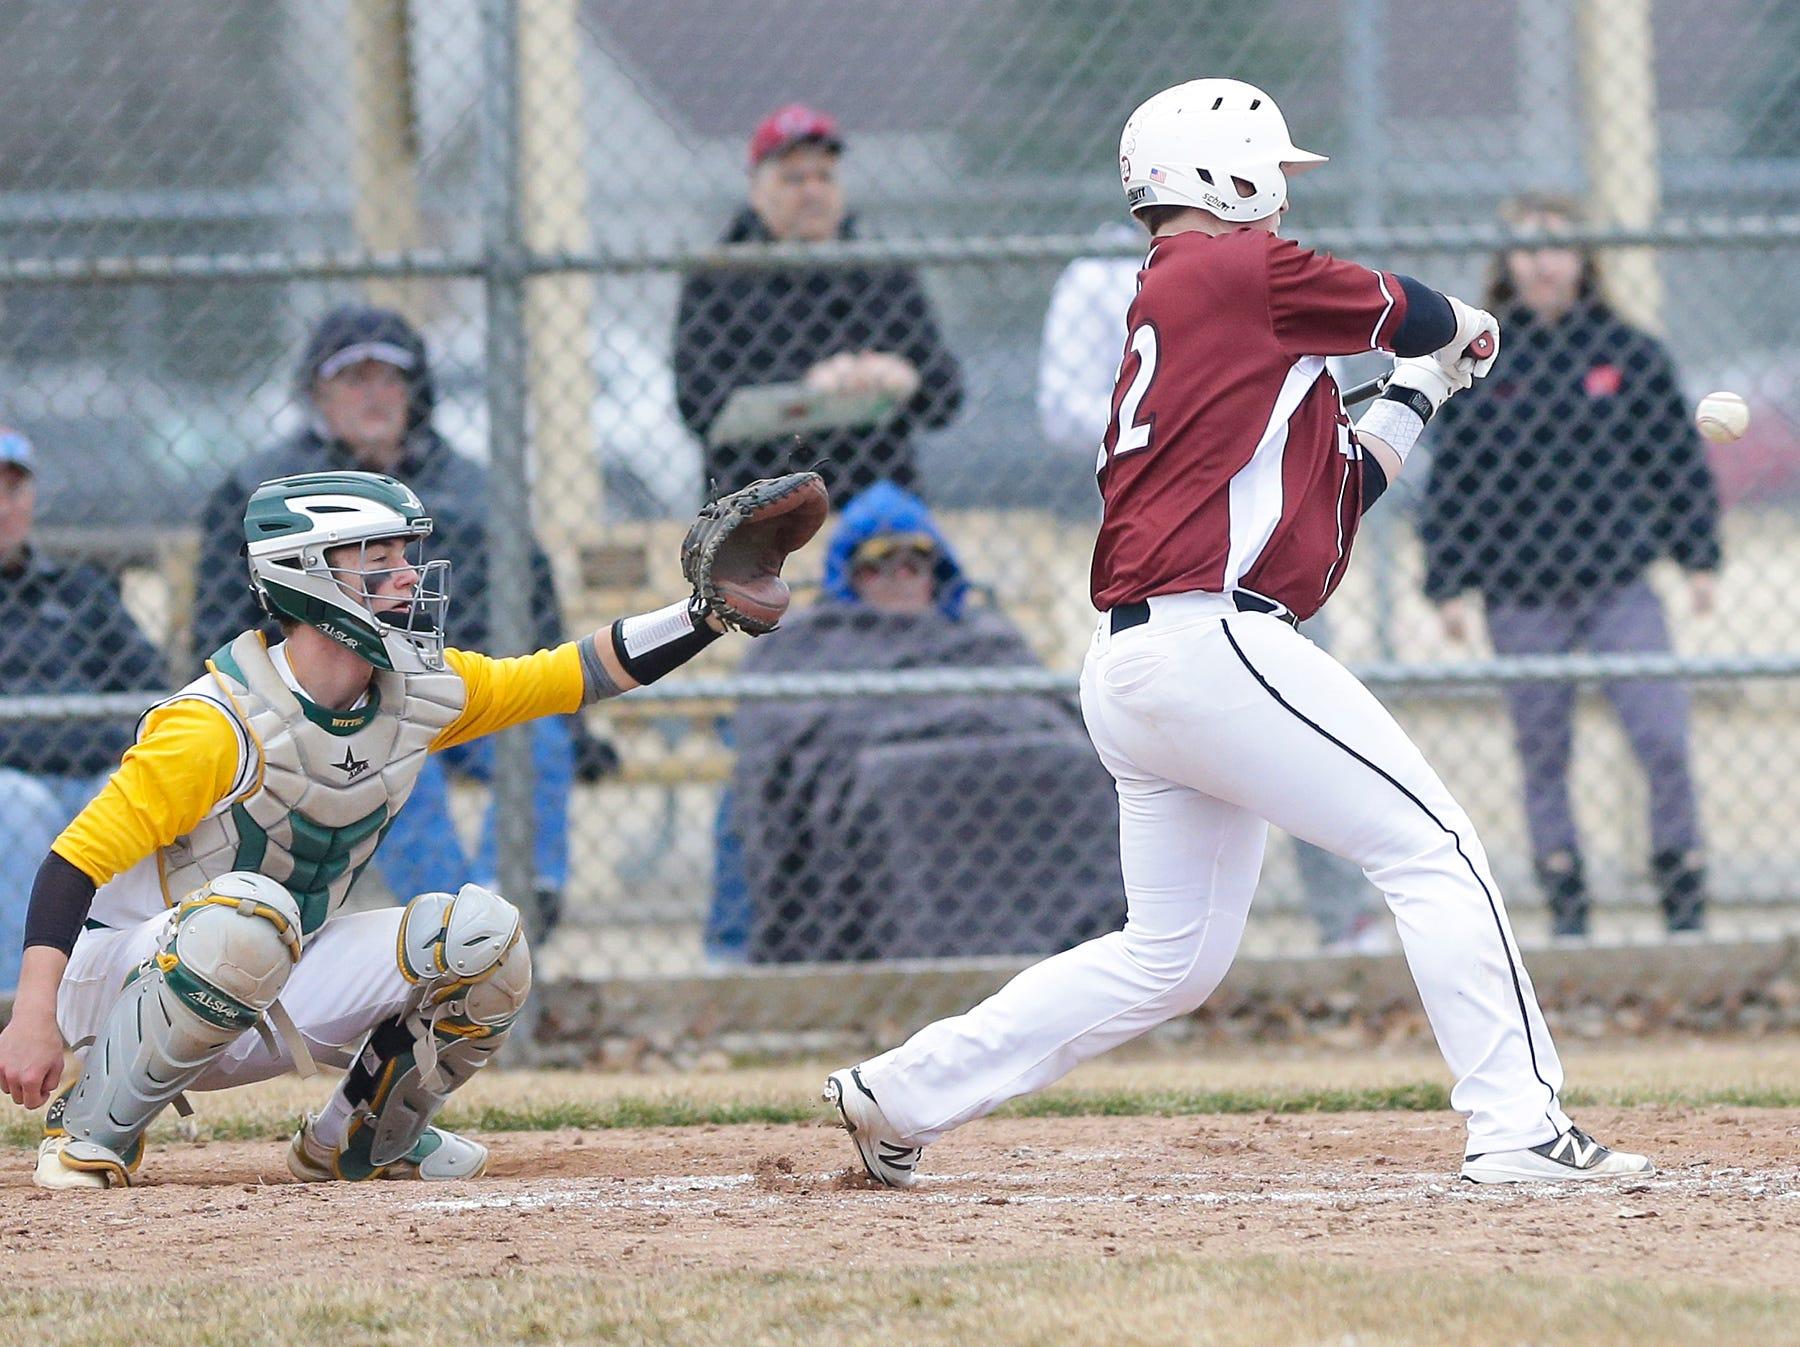 Fond du Lac High School baseball's Dawson Wyrobeck swings at a pitch against Ashwaubenon High School Saturday, April 6, 2019 during their game in Fond du Lac, Wis. Fond du Lac won the game 5-3. Doug Raflik/USA TODAY NETWORK-Wisconsin